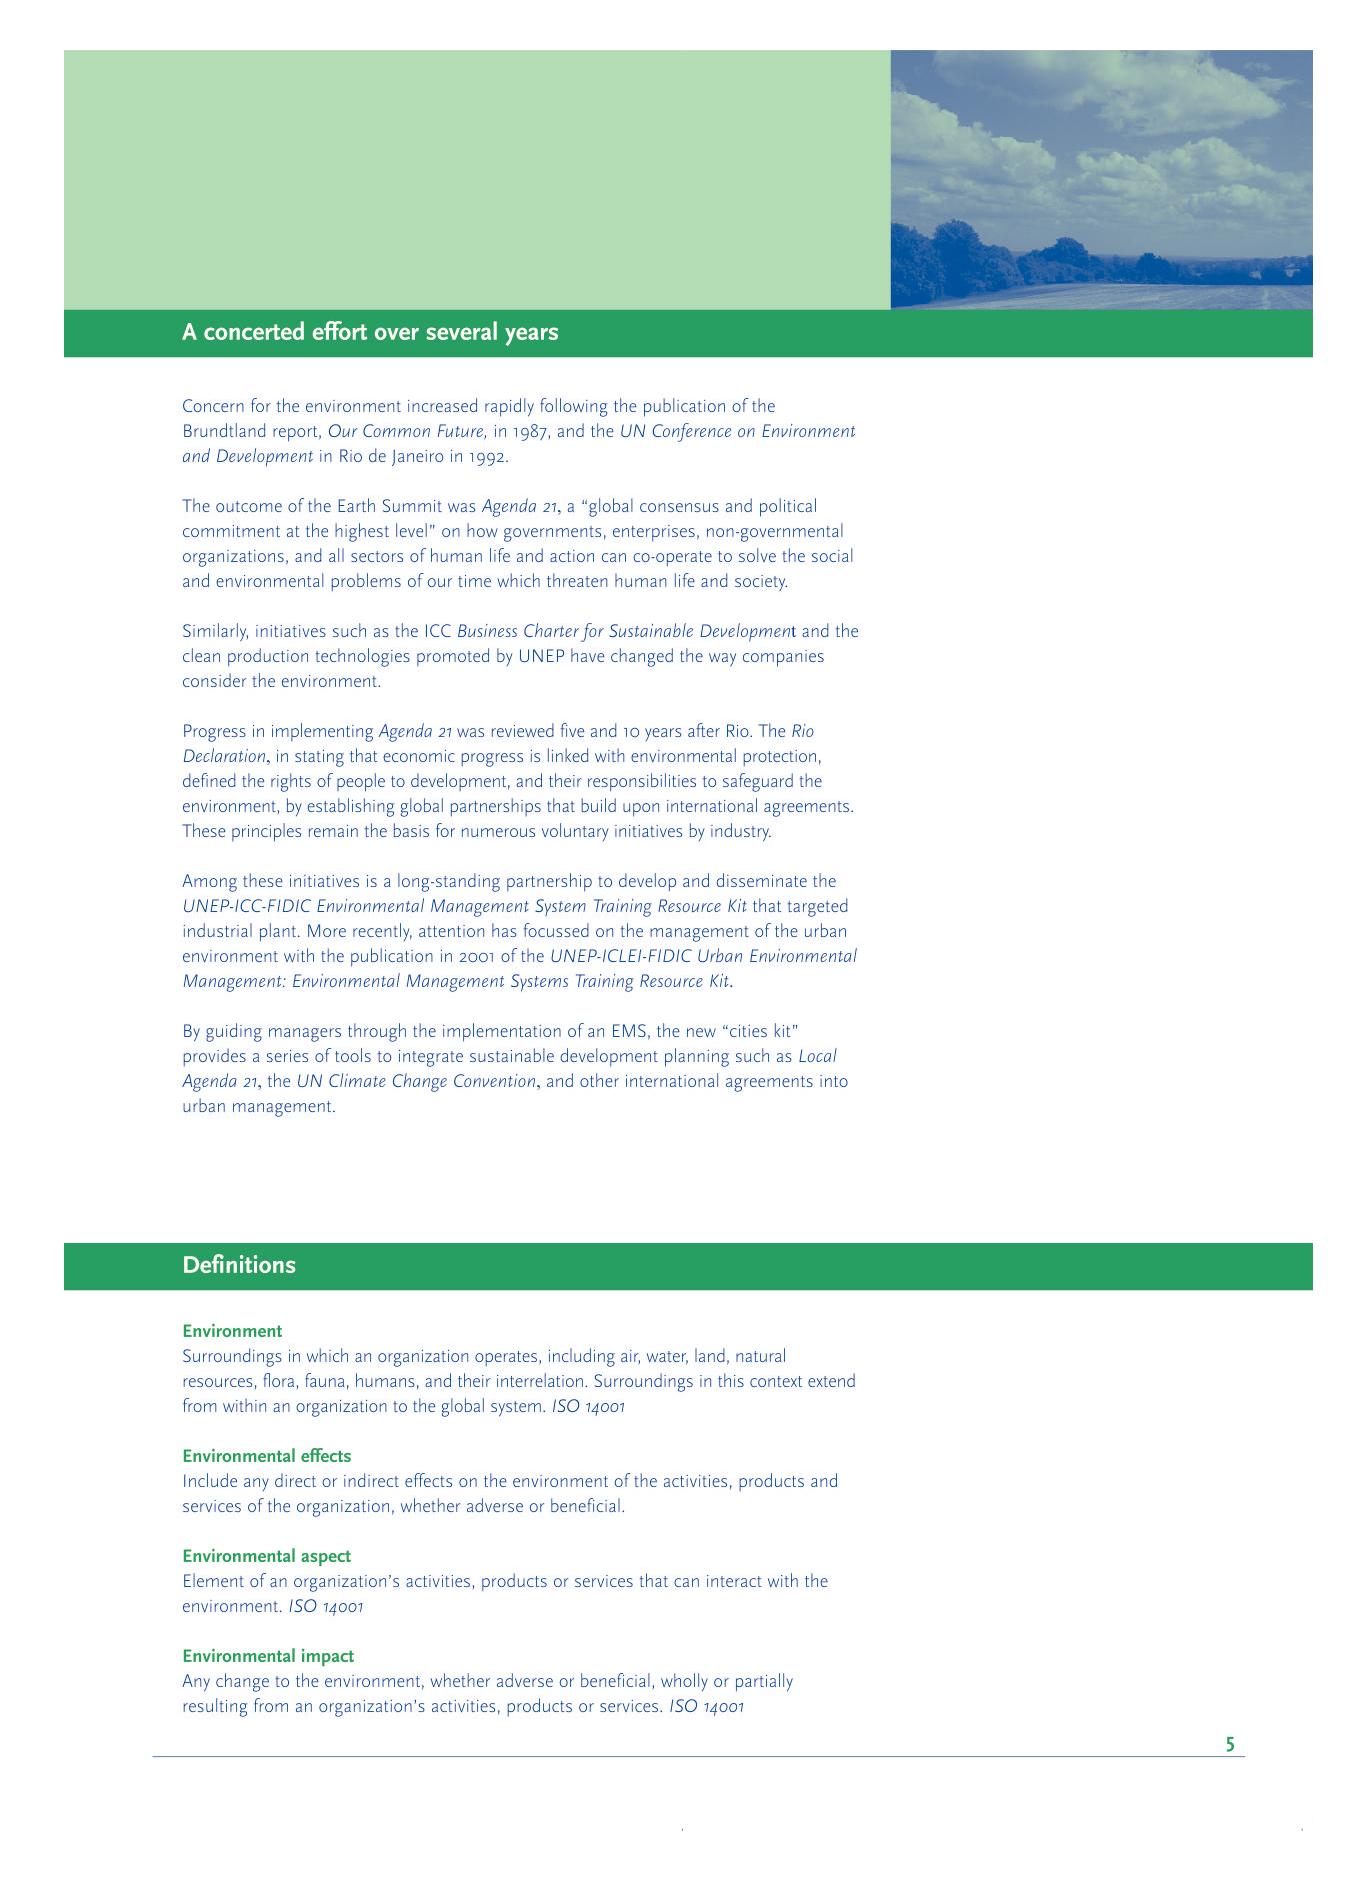 EMS (Environmental Management System) Training Resource Kit